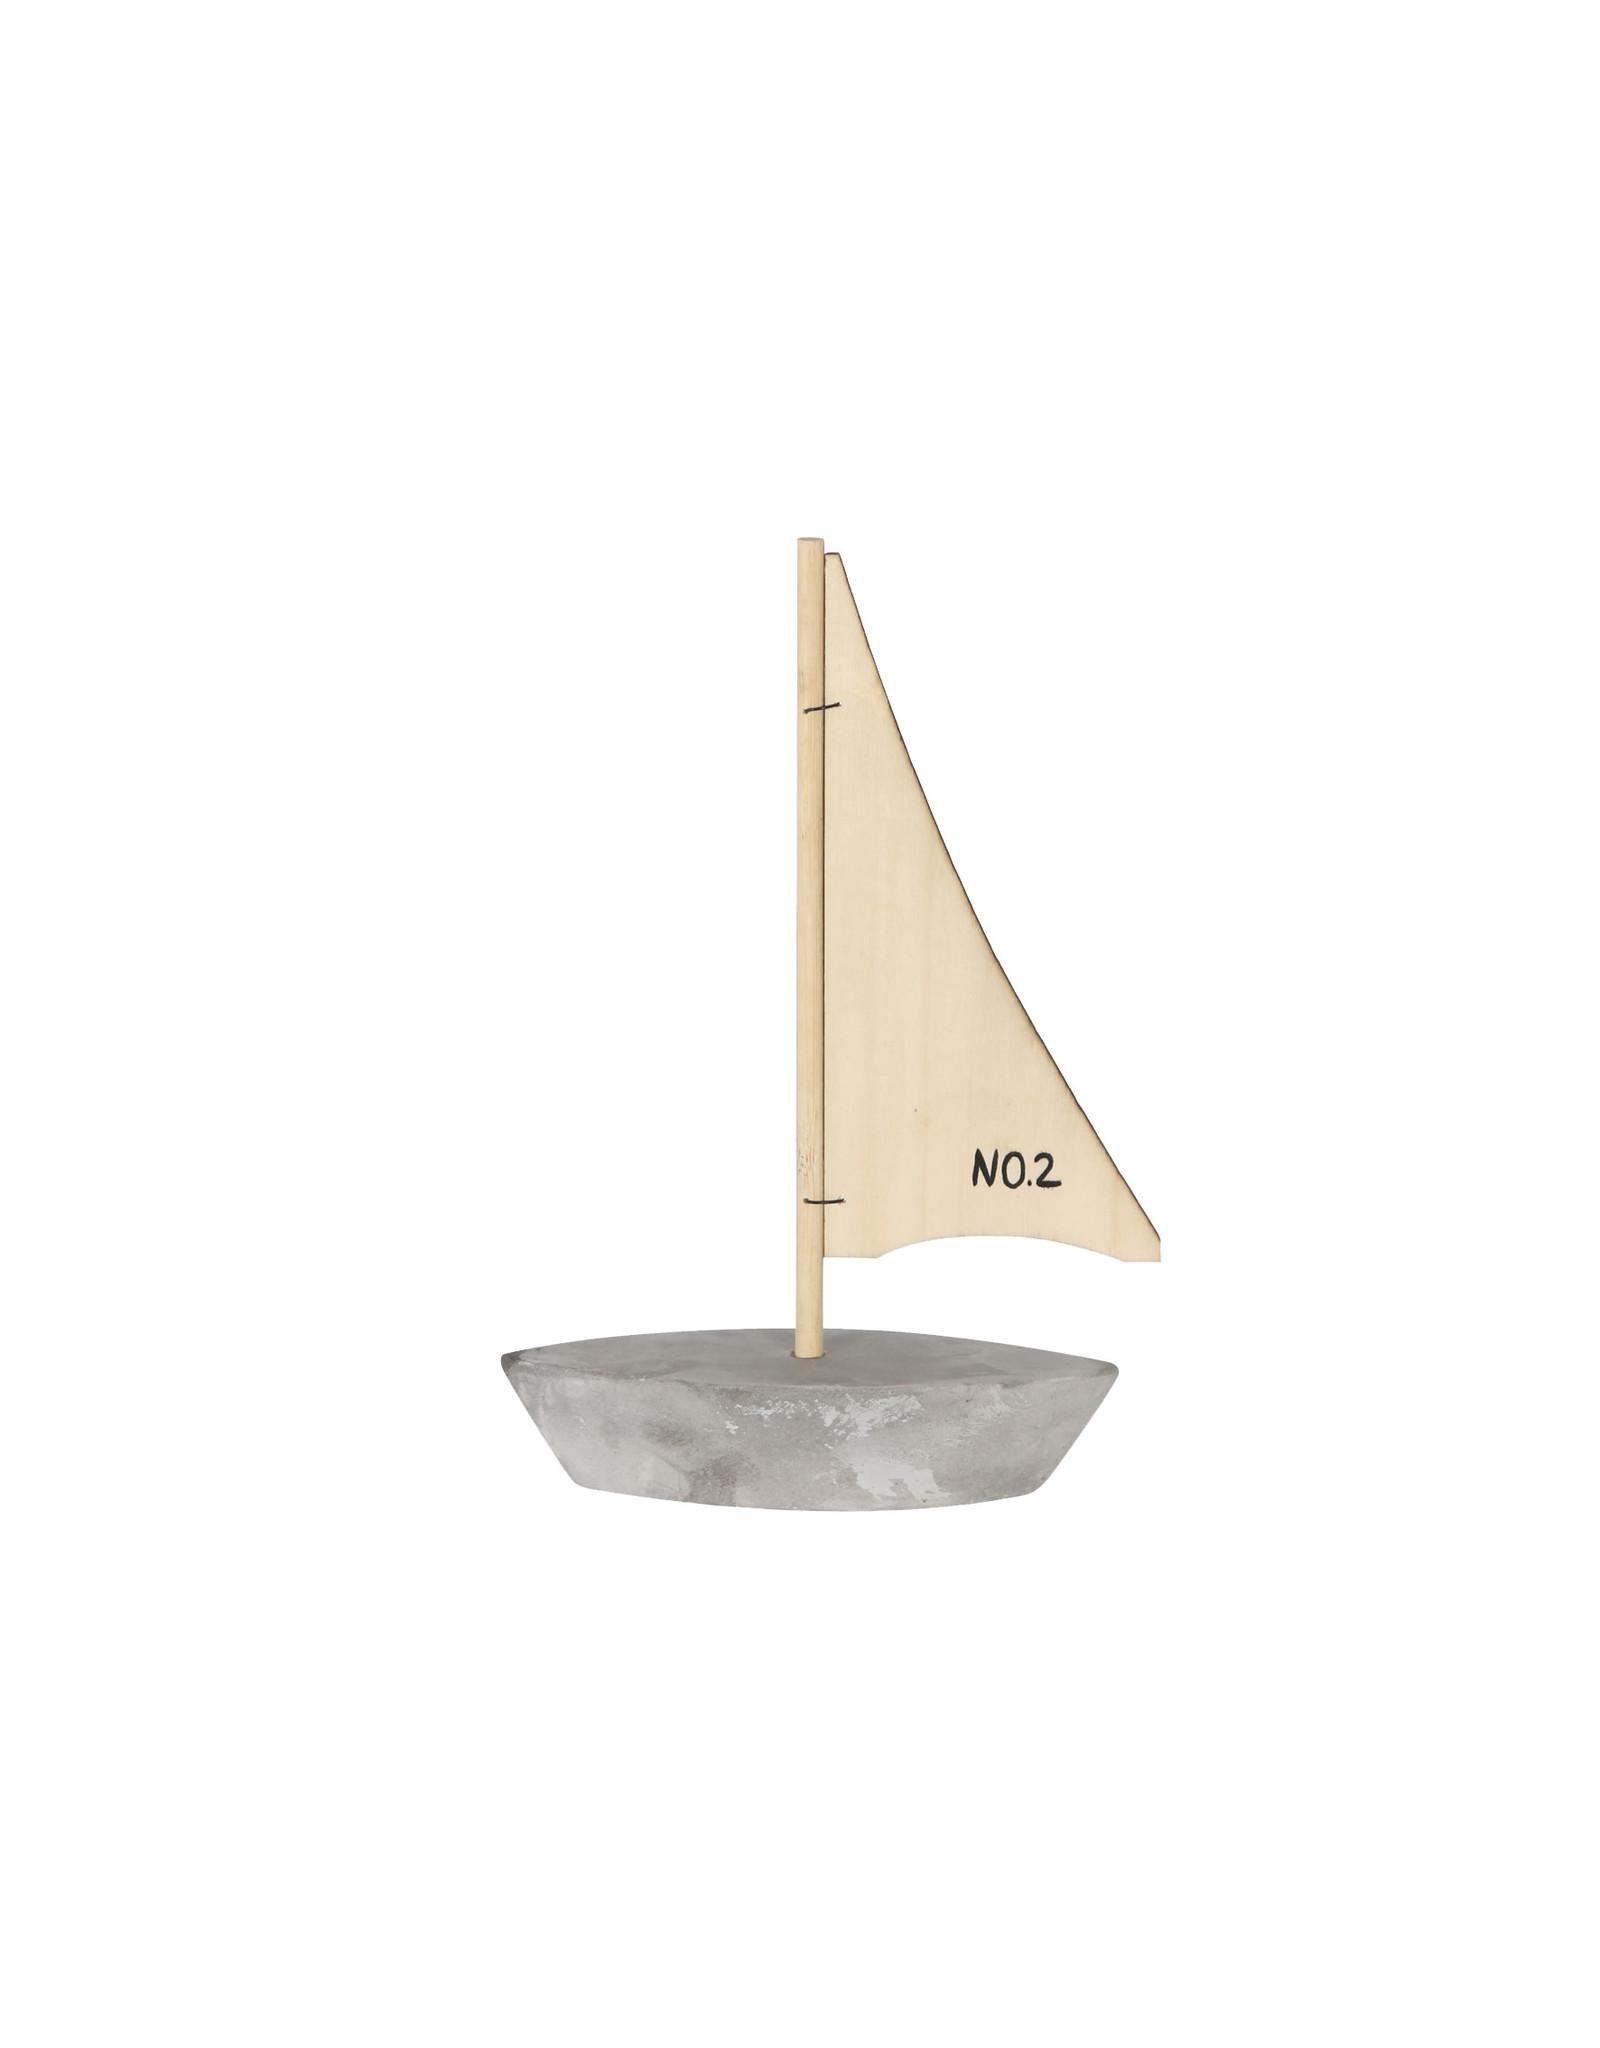 Dijk Boat Cement - 15x5x23.5cm